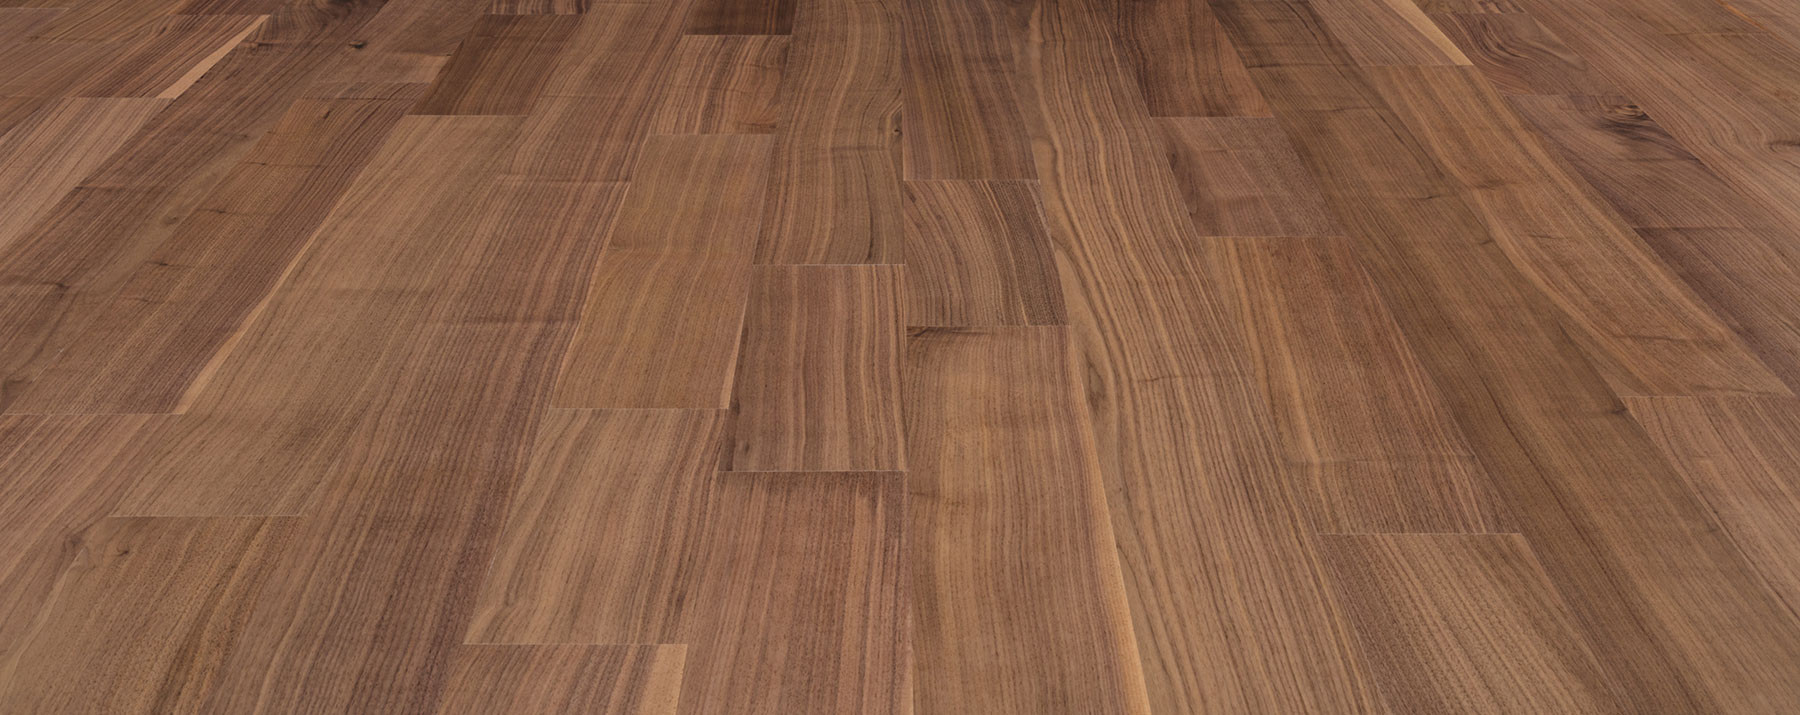 Prefinished Hardwood Flooring Beveled Edges Of American Quartered Walnut 5″ Etx Surfaces In American Quartered Walnut 5″ American Quartered Walnut Engineered Wood Flooring